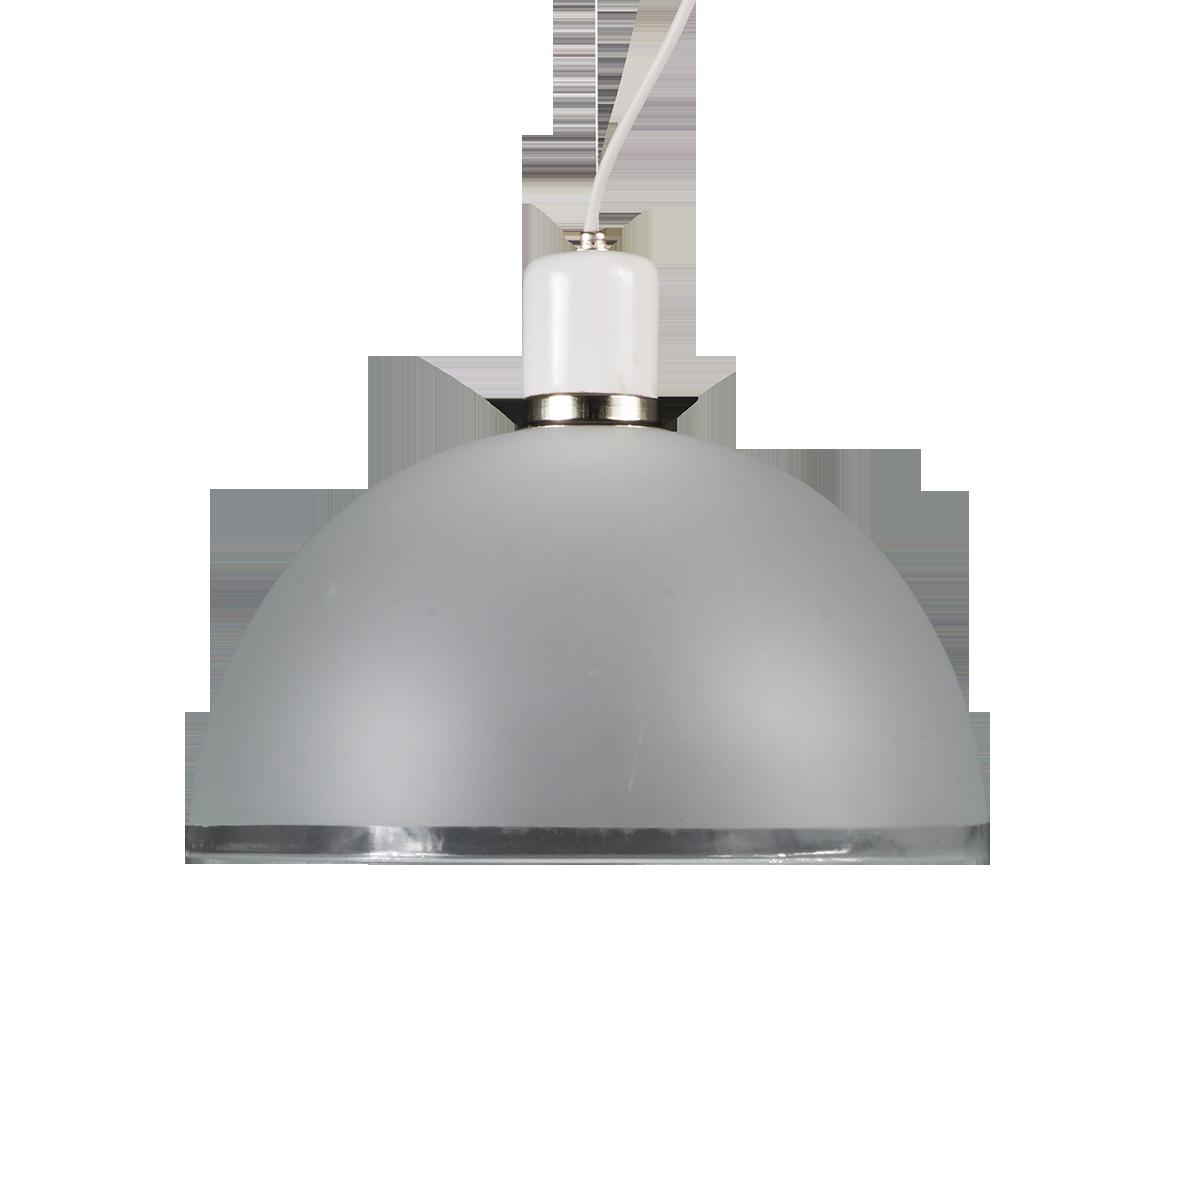 Carilux Fabrica De Iluminaci N En Madera